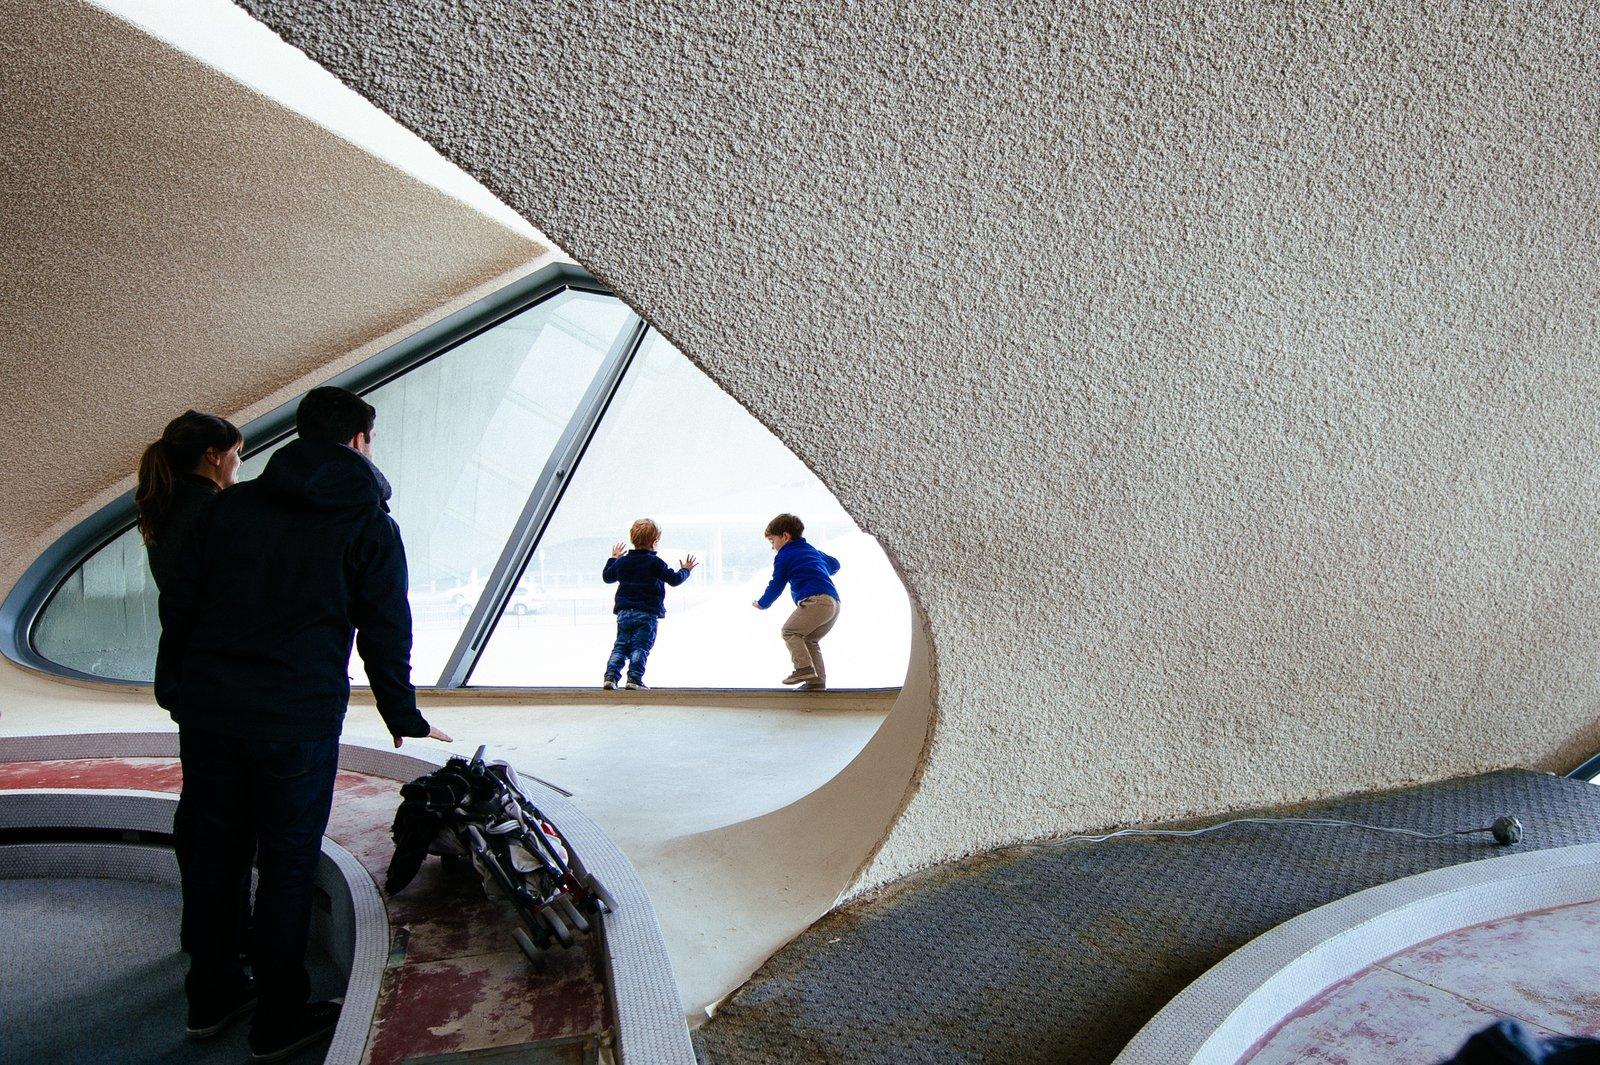 TWA Flight Center by Eero Saarinen  TWA Flight Center by Eero Saarinen by COOL HUNTING